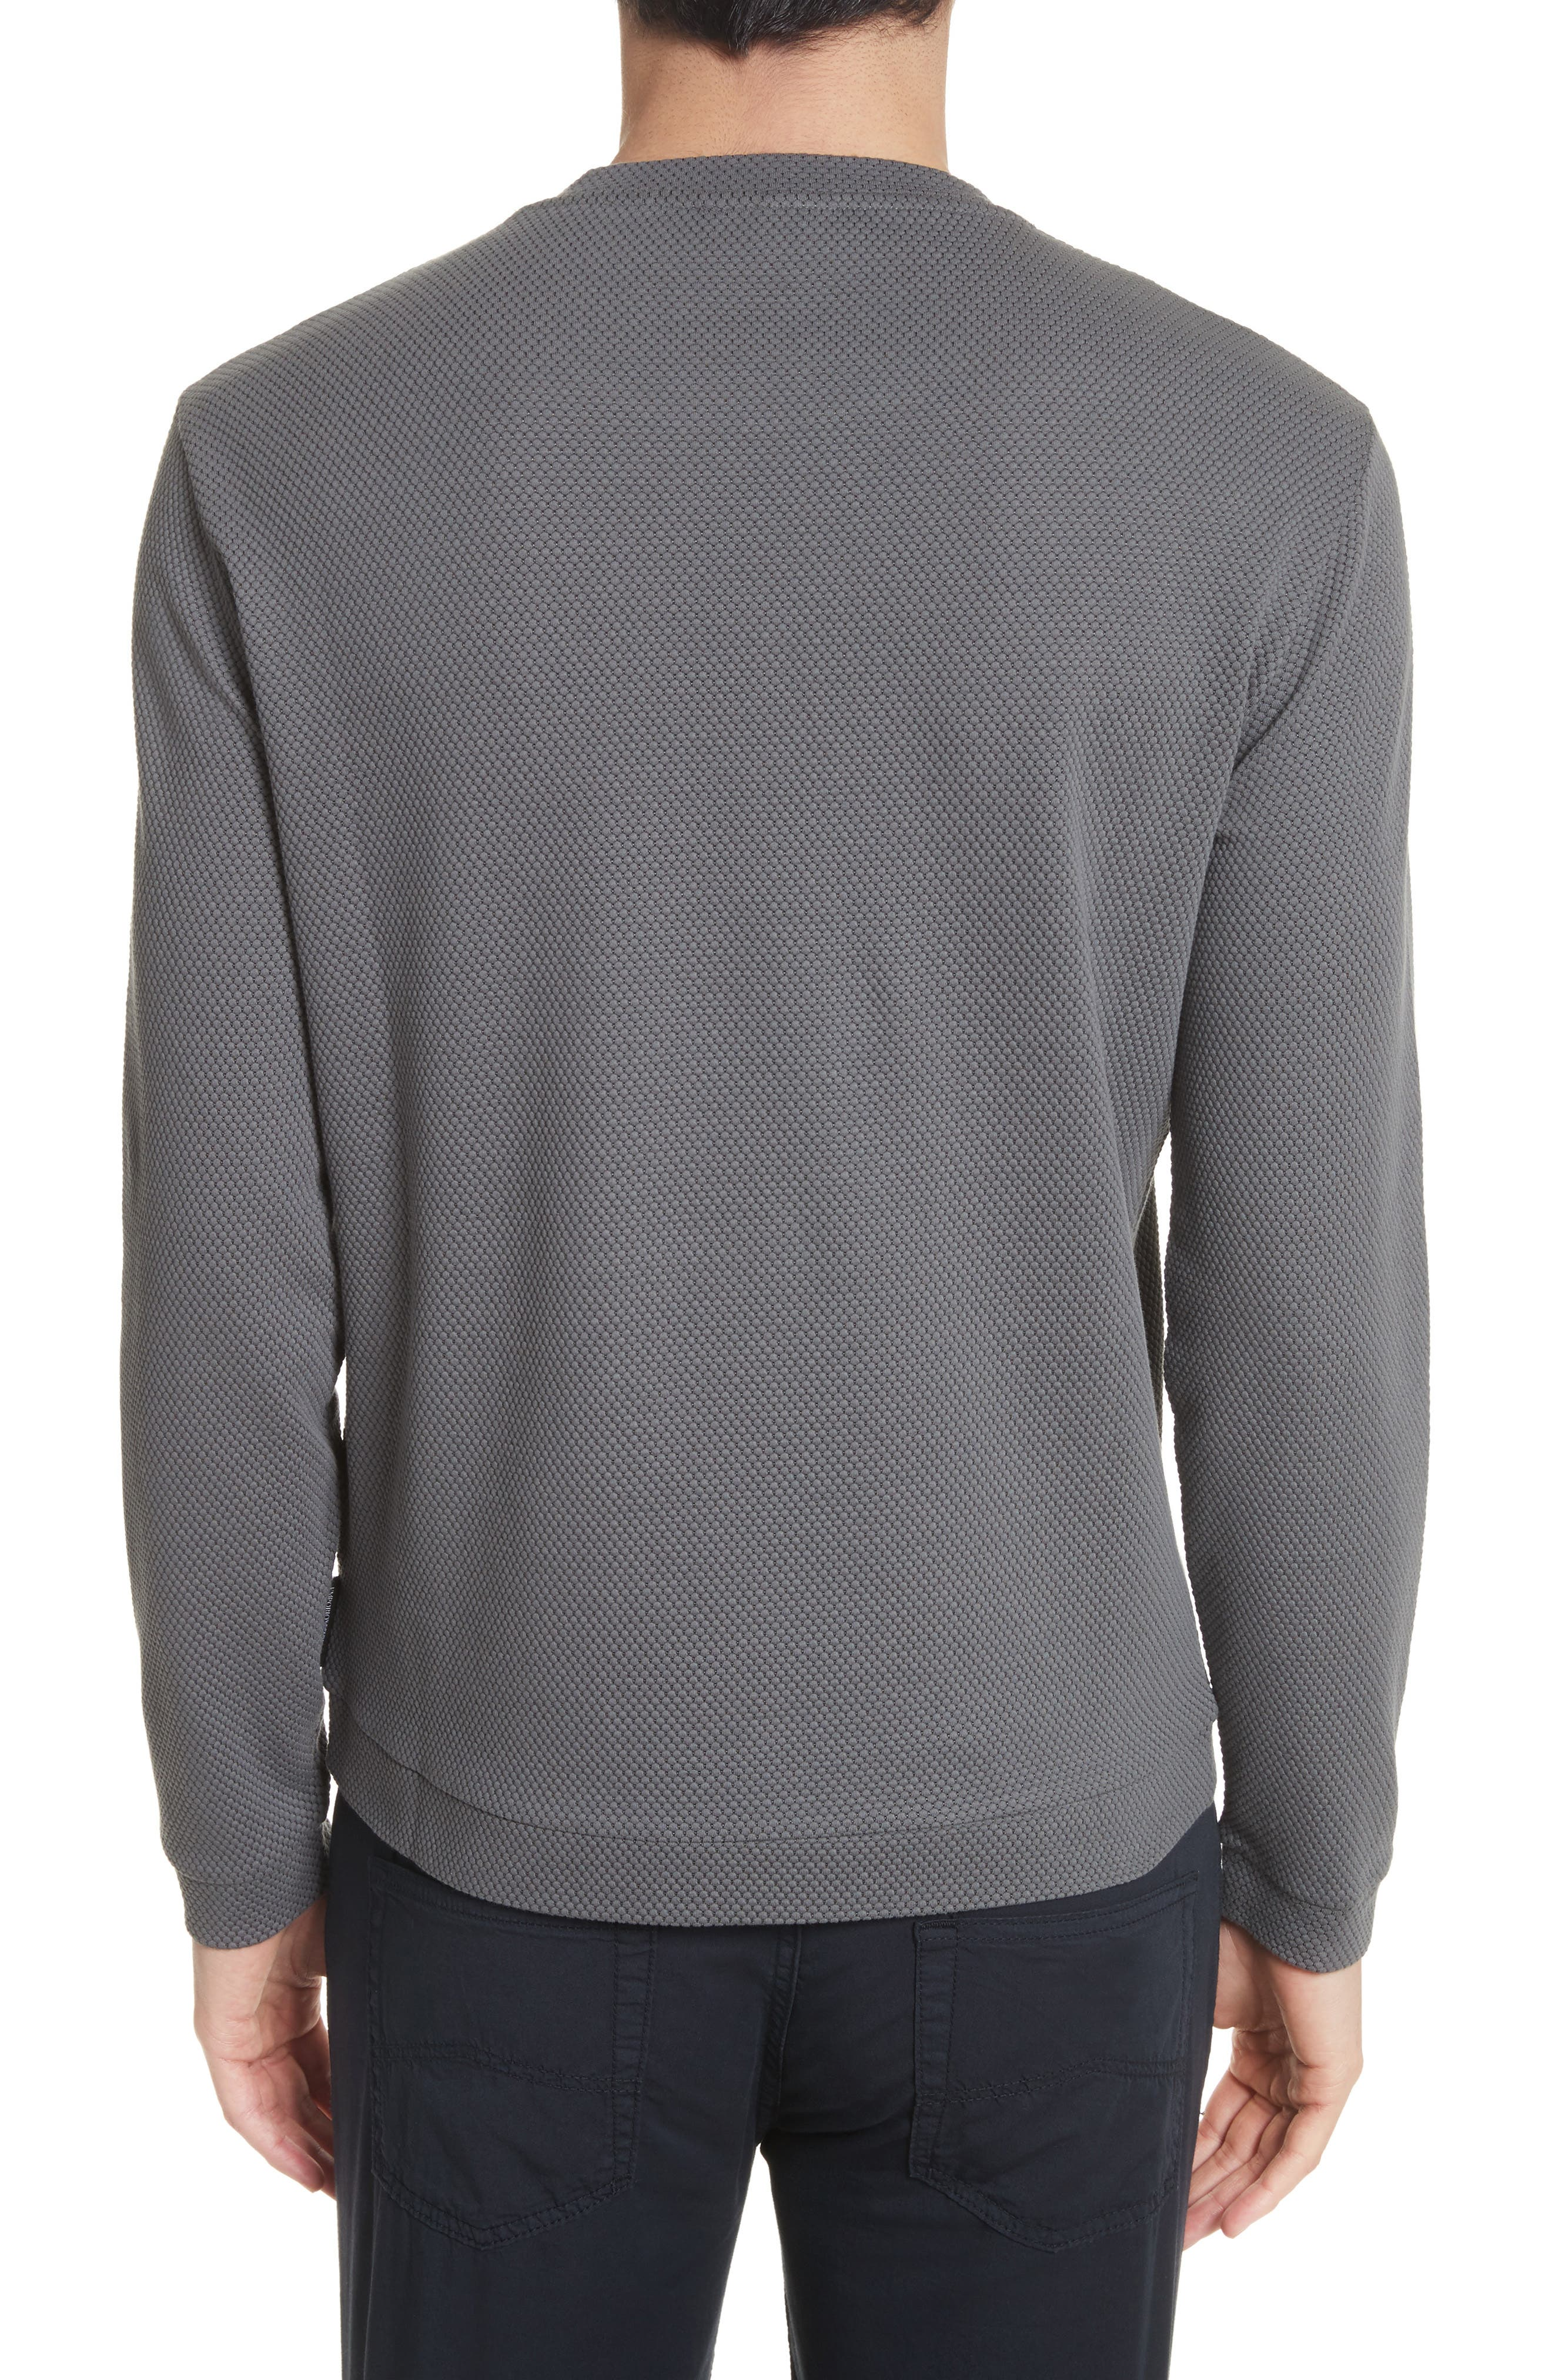 Alternate Image 2  - Emporio Armani Honeycomb Jacquard Slim Fit T-Shirt